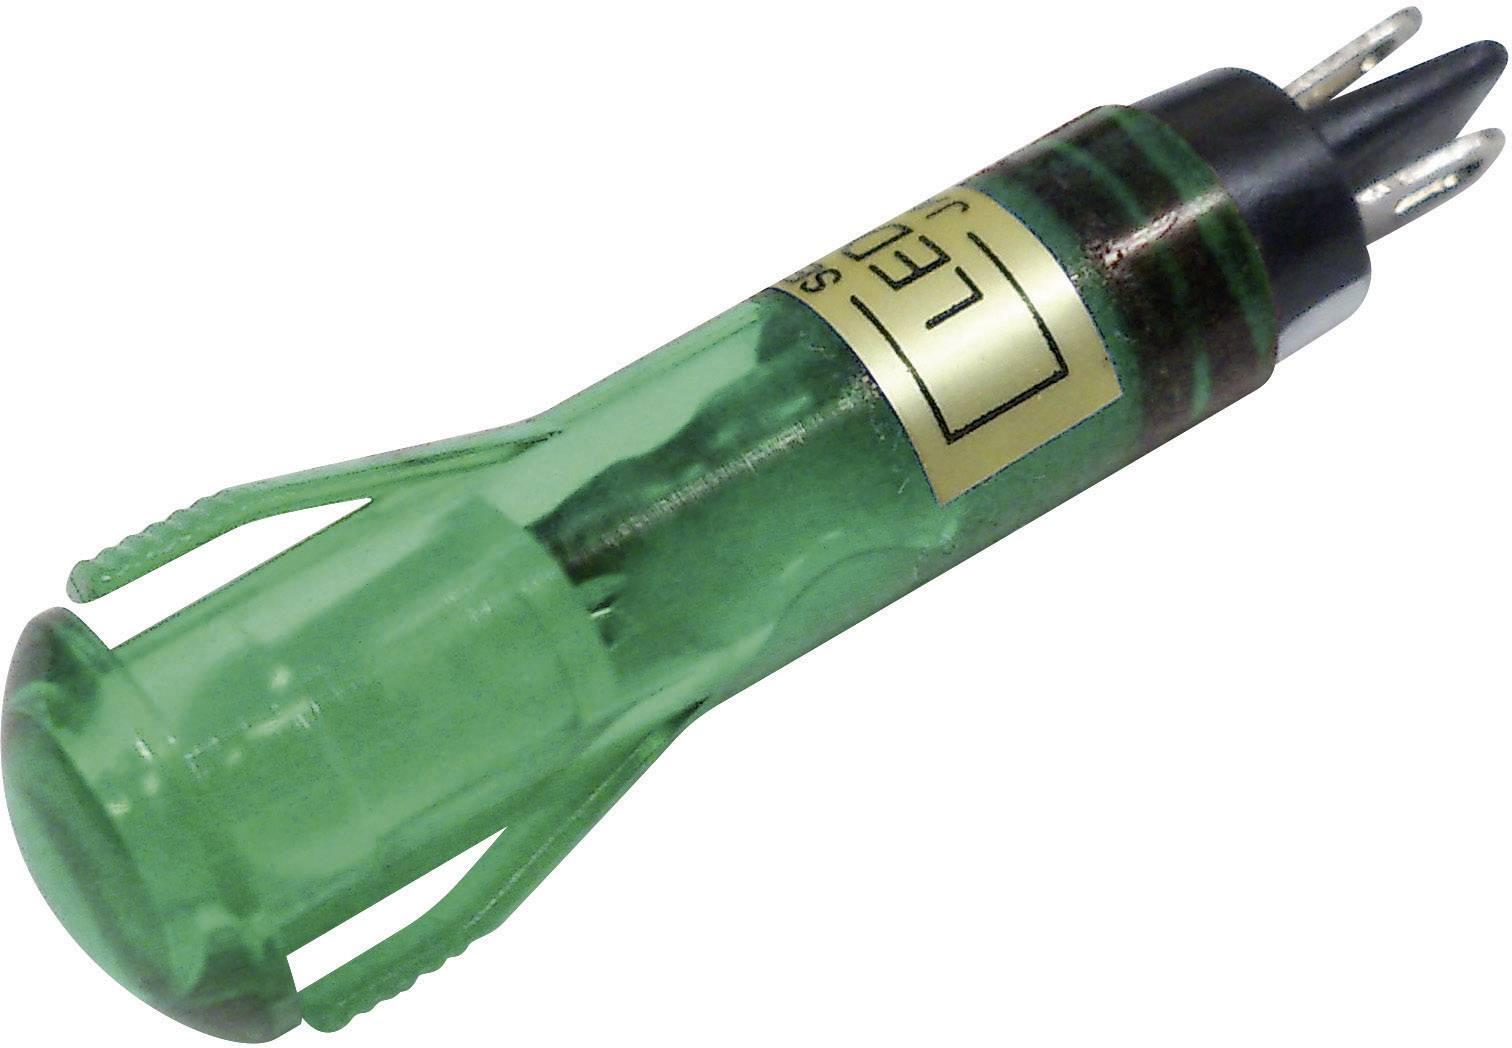 IndikačnéLED Sedeco BD-0819, 12 V/DC, zelená